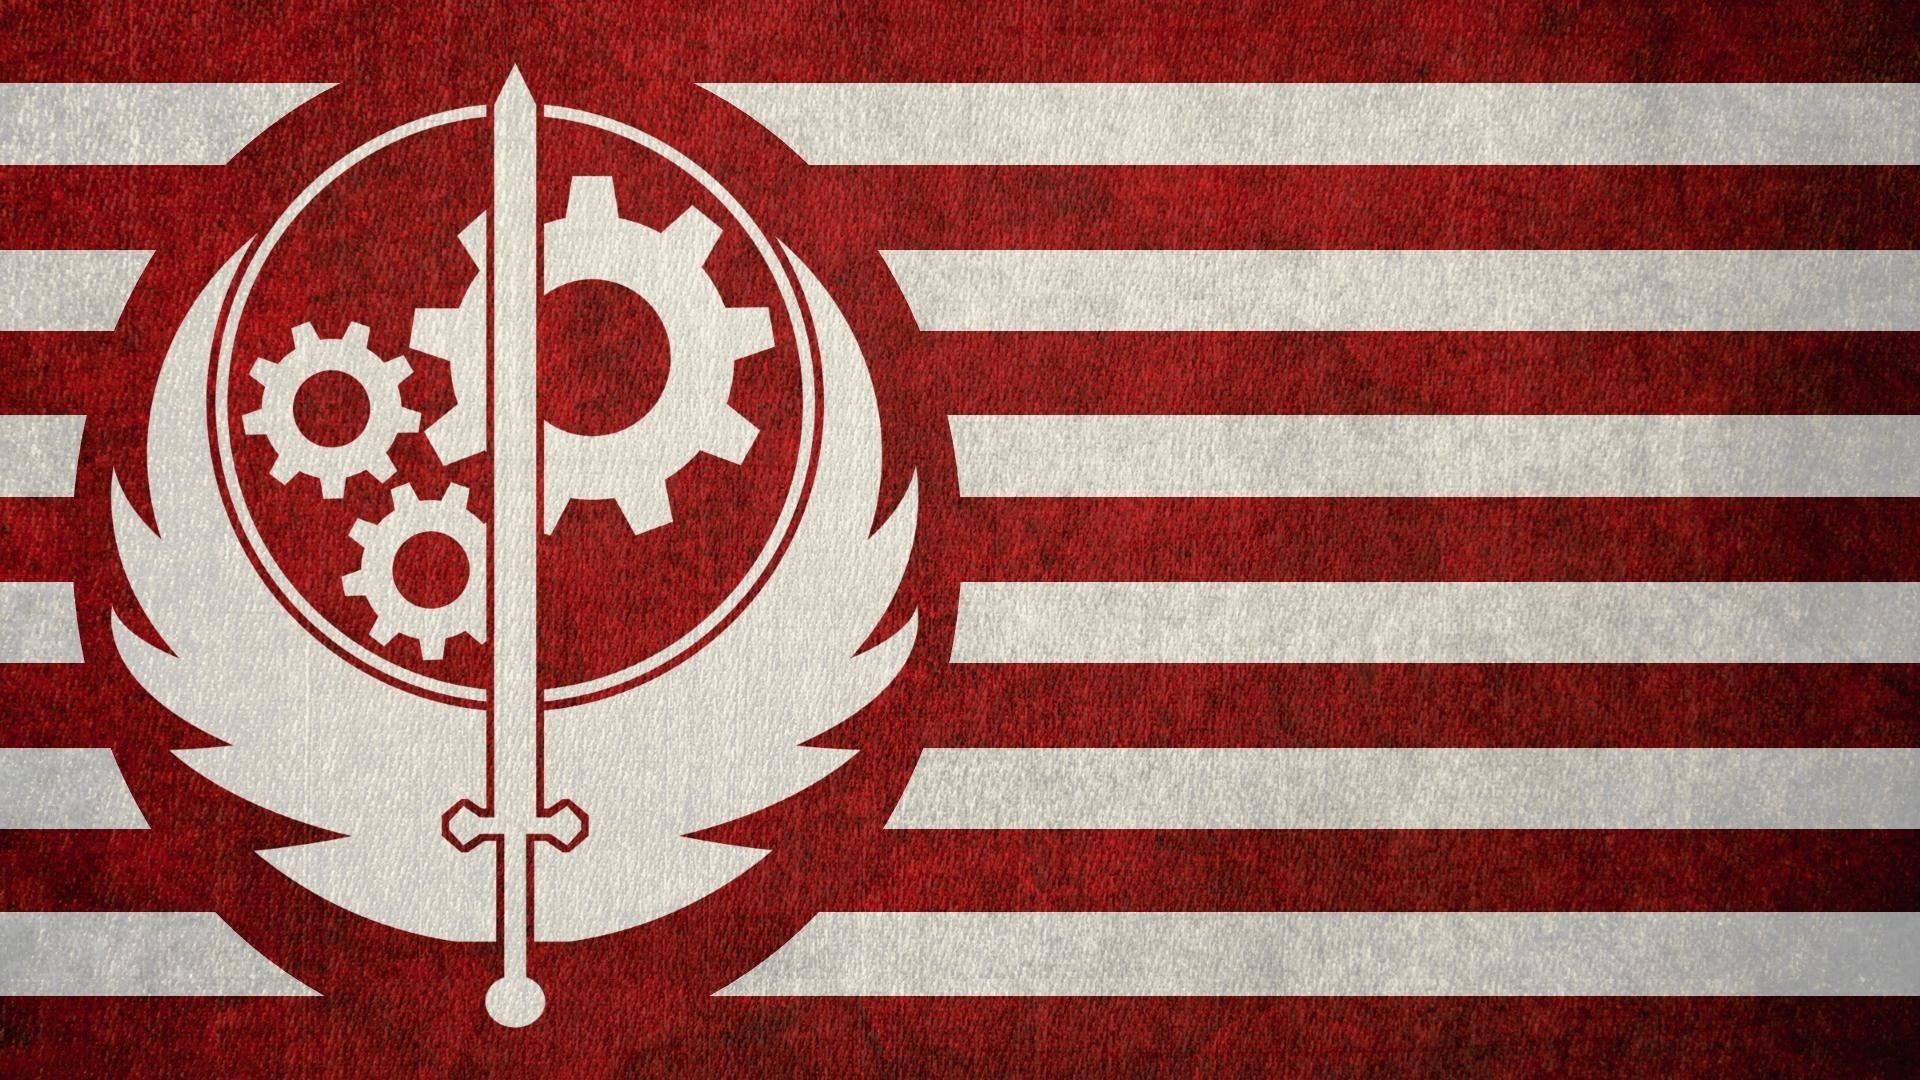 Fallout Game, Flag, Brotherhood of Steel, Sword, Symbol.